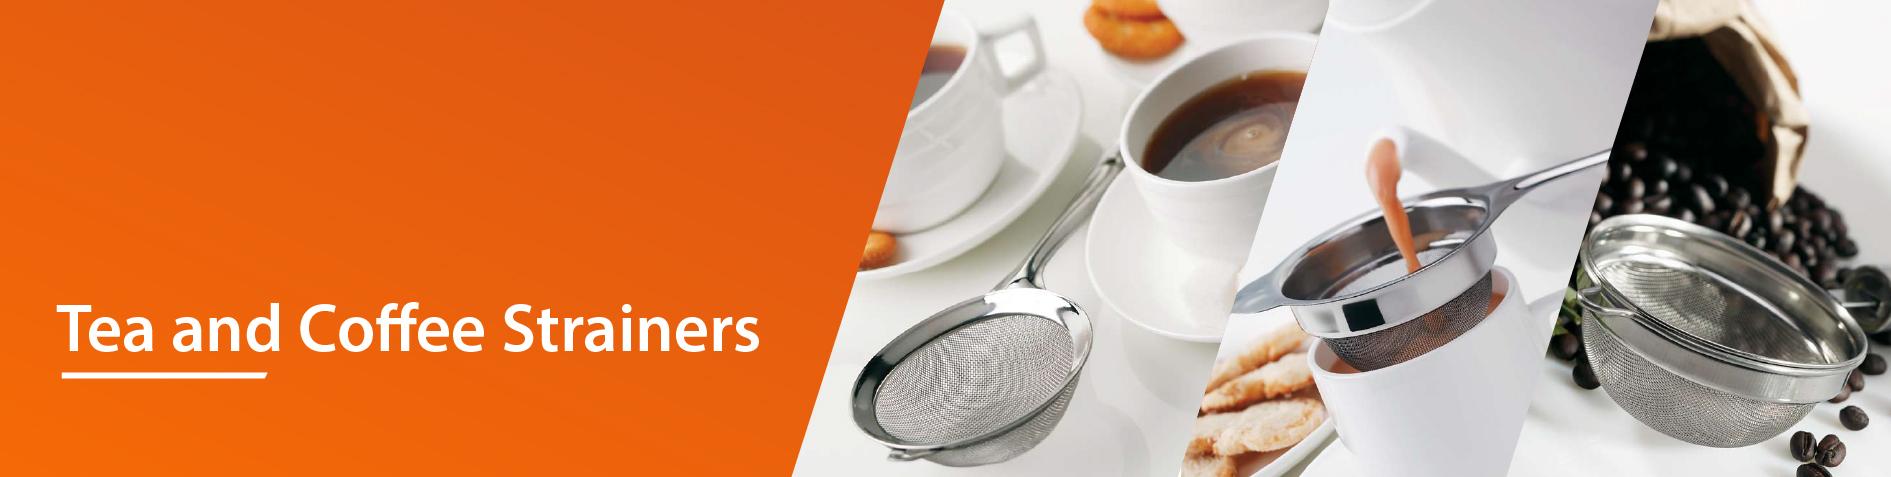 Stainless Steel Kitchen Tea Strainer Factories Tea And Coffee Strainer Mesh Tea Infuser Manufacturers